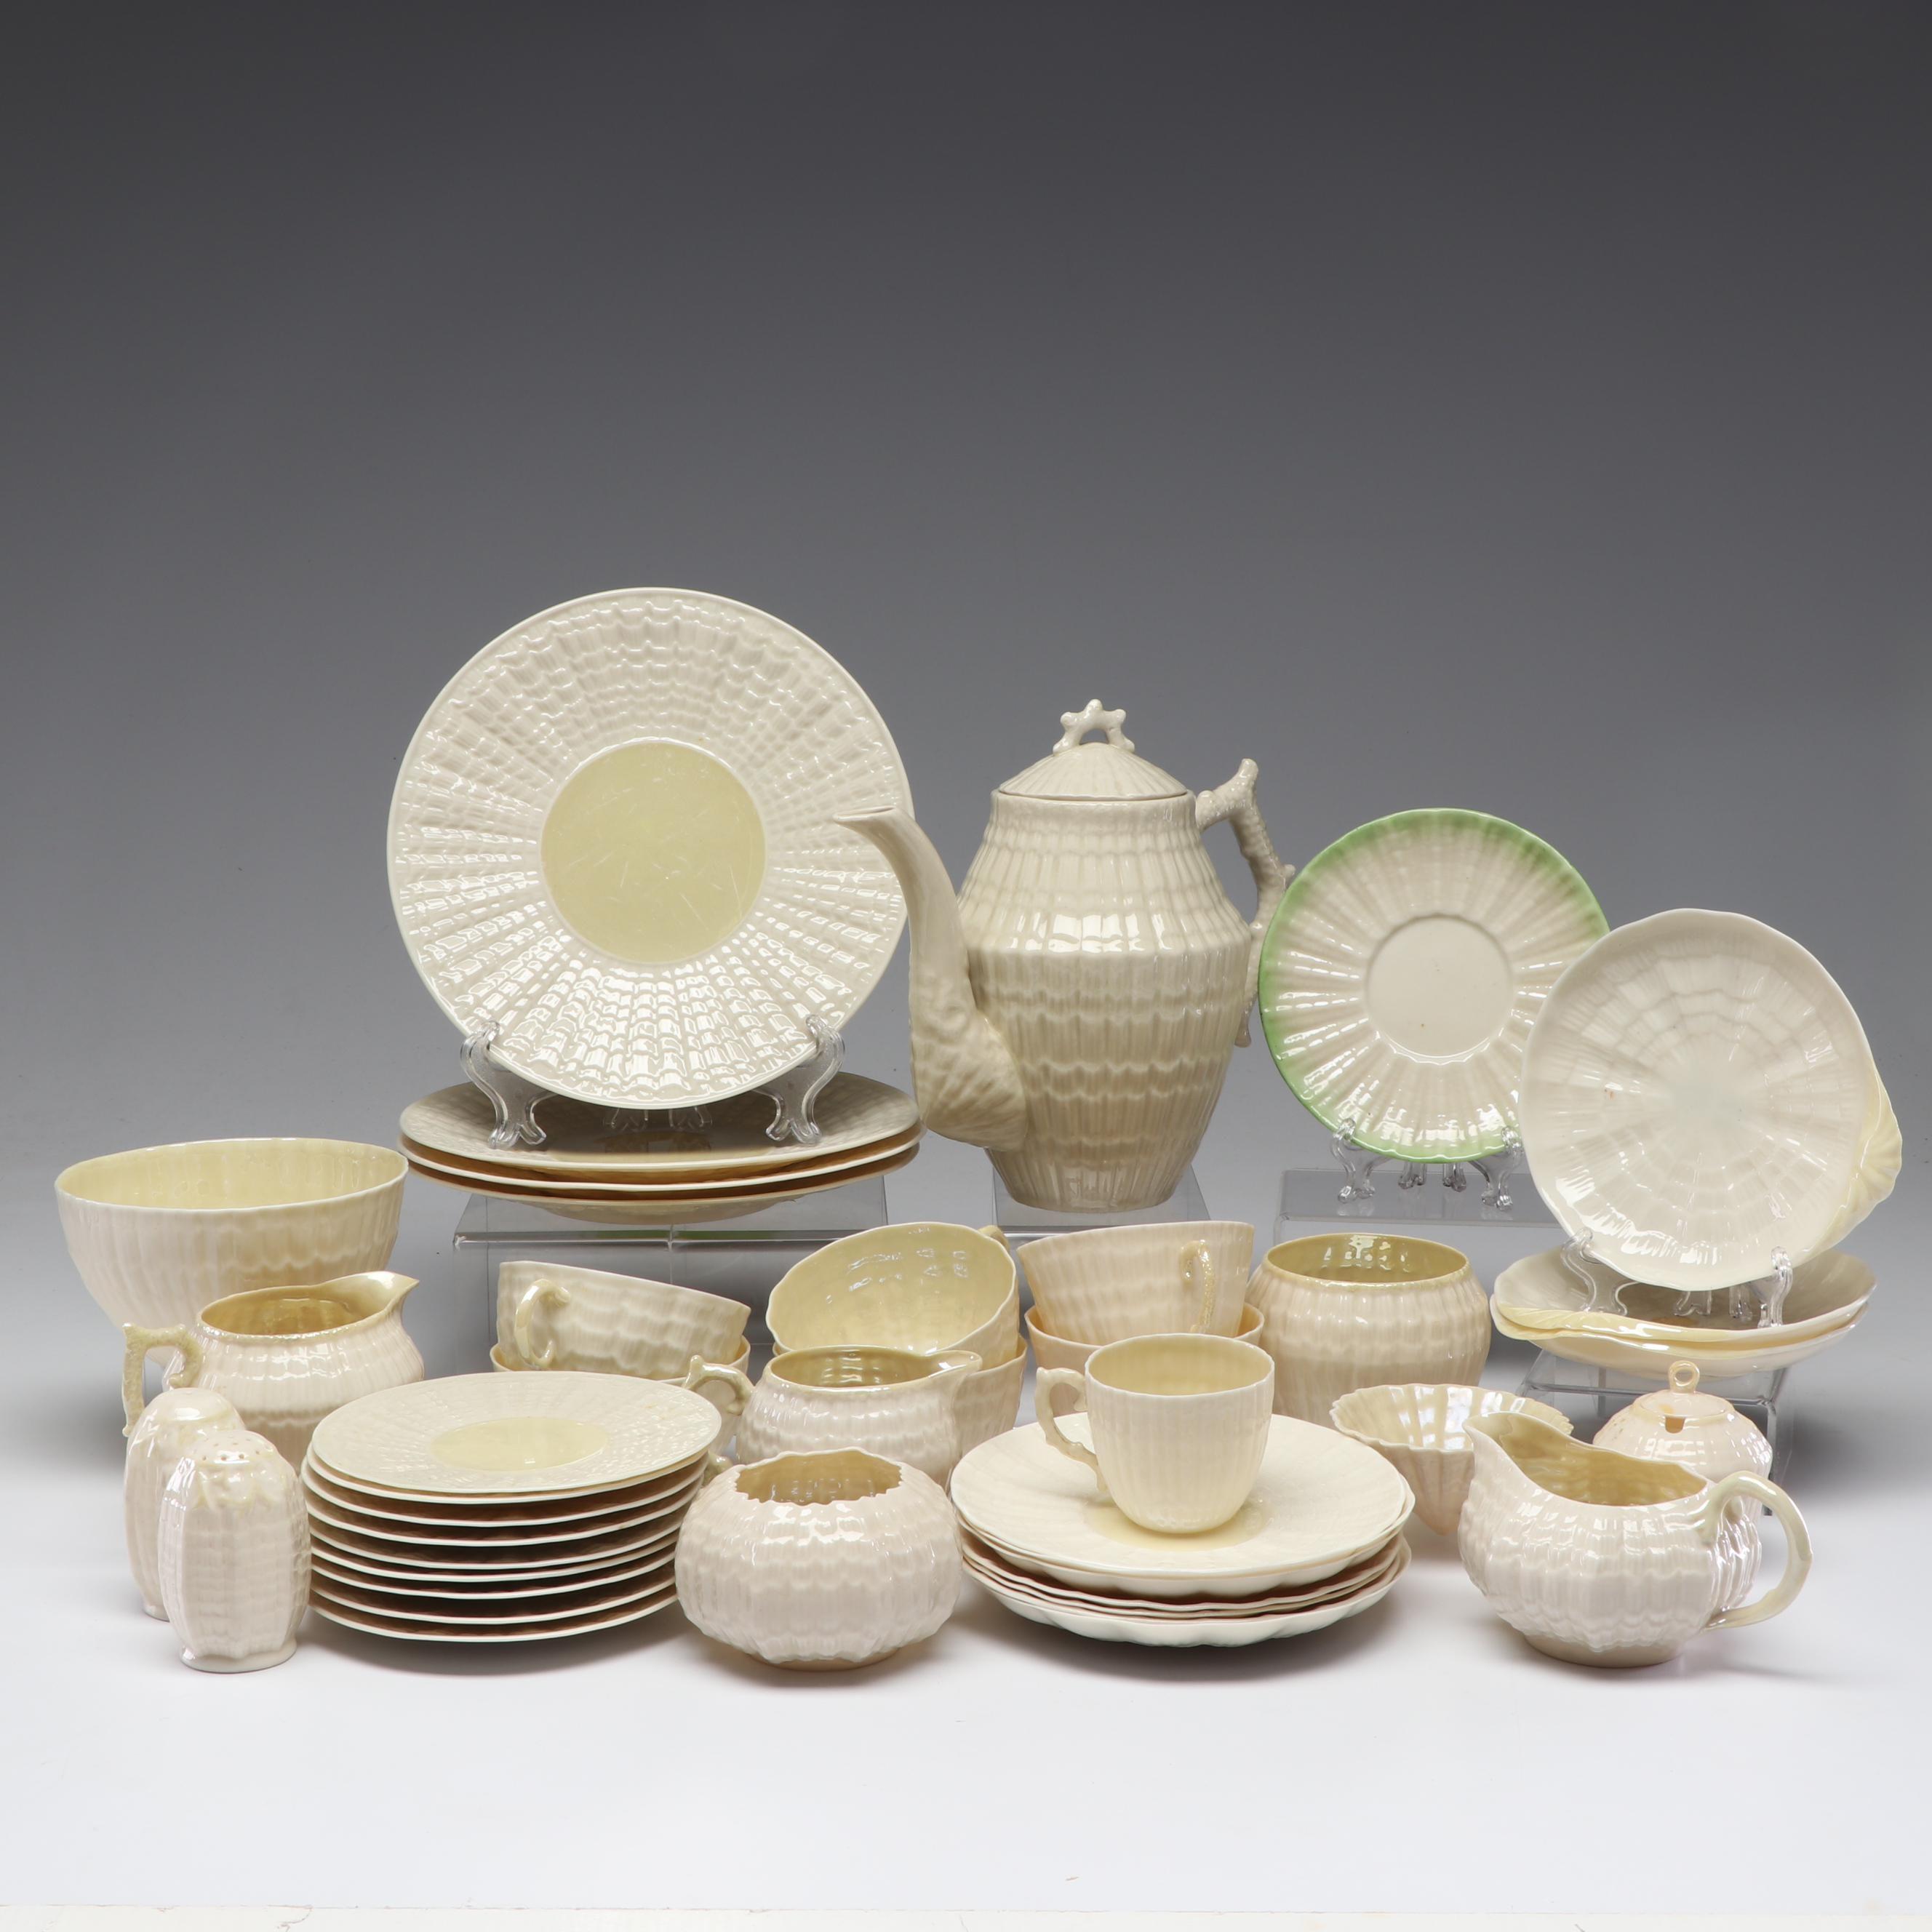 Belleek Porcelain Tea Serving and Tableware Pieces